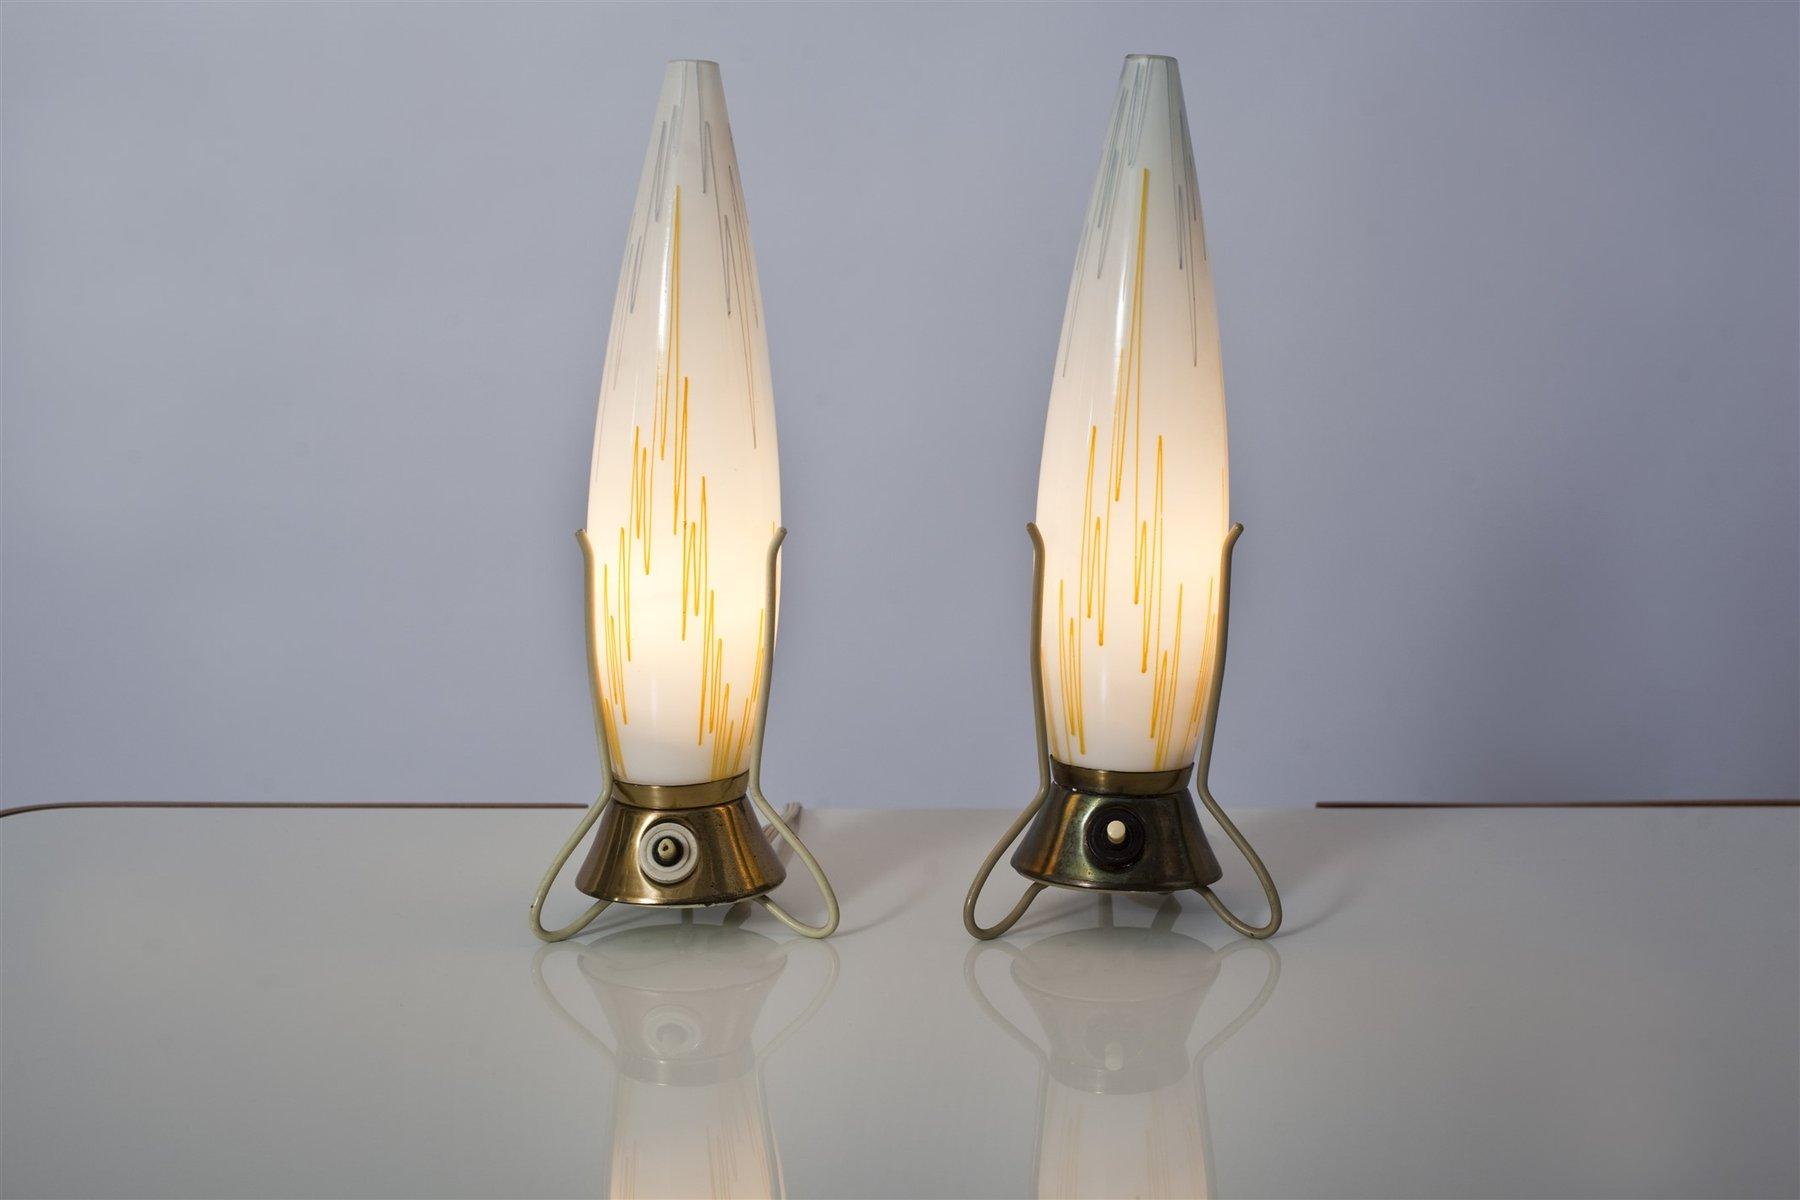 Vintage Czech Tripod Table Lamps, Set Of 2